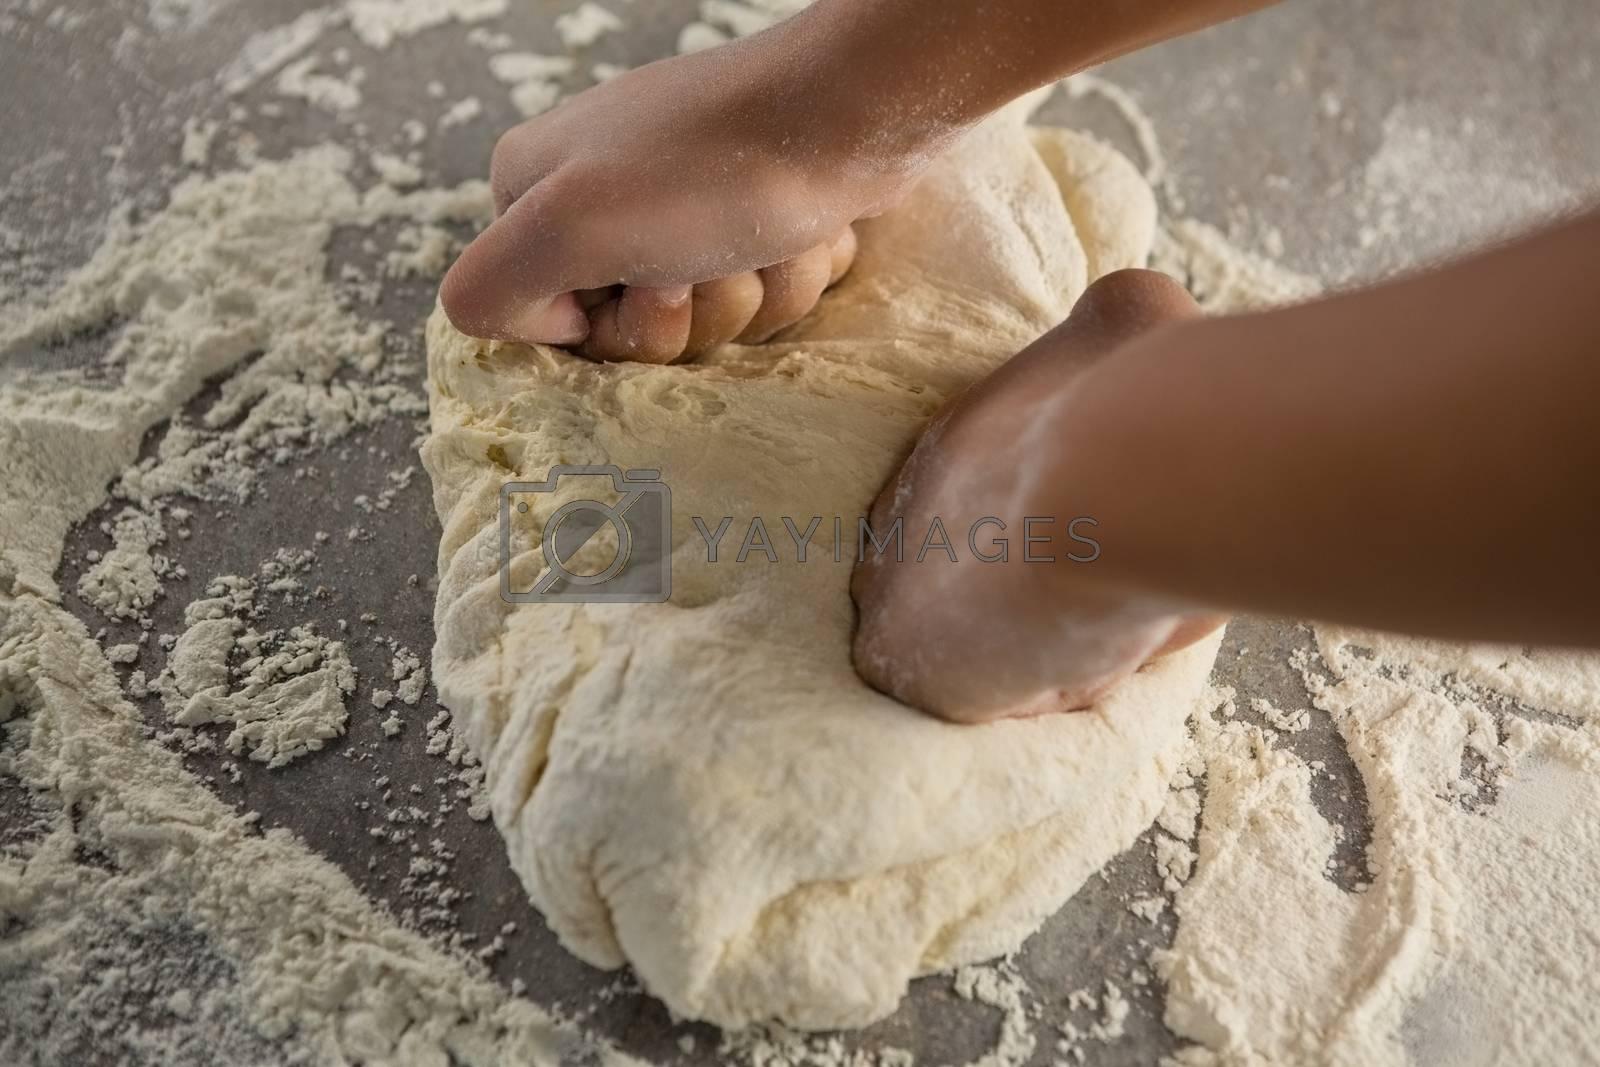 Woman kneading a dough by Wavebreakmedia